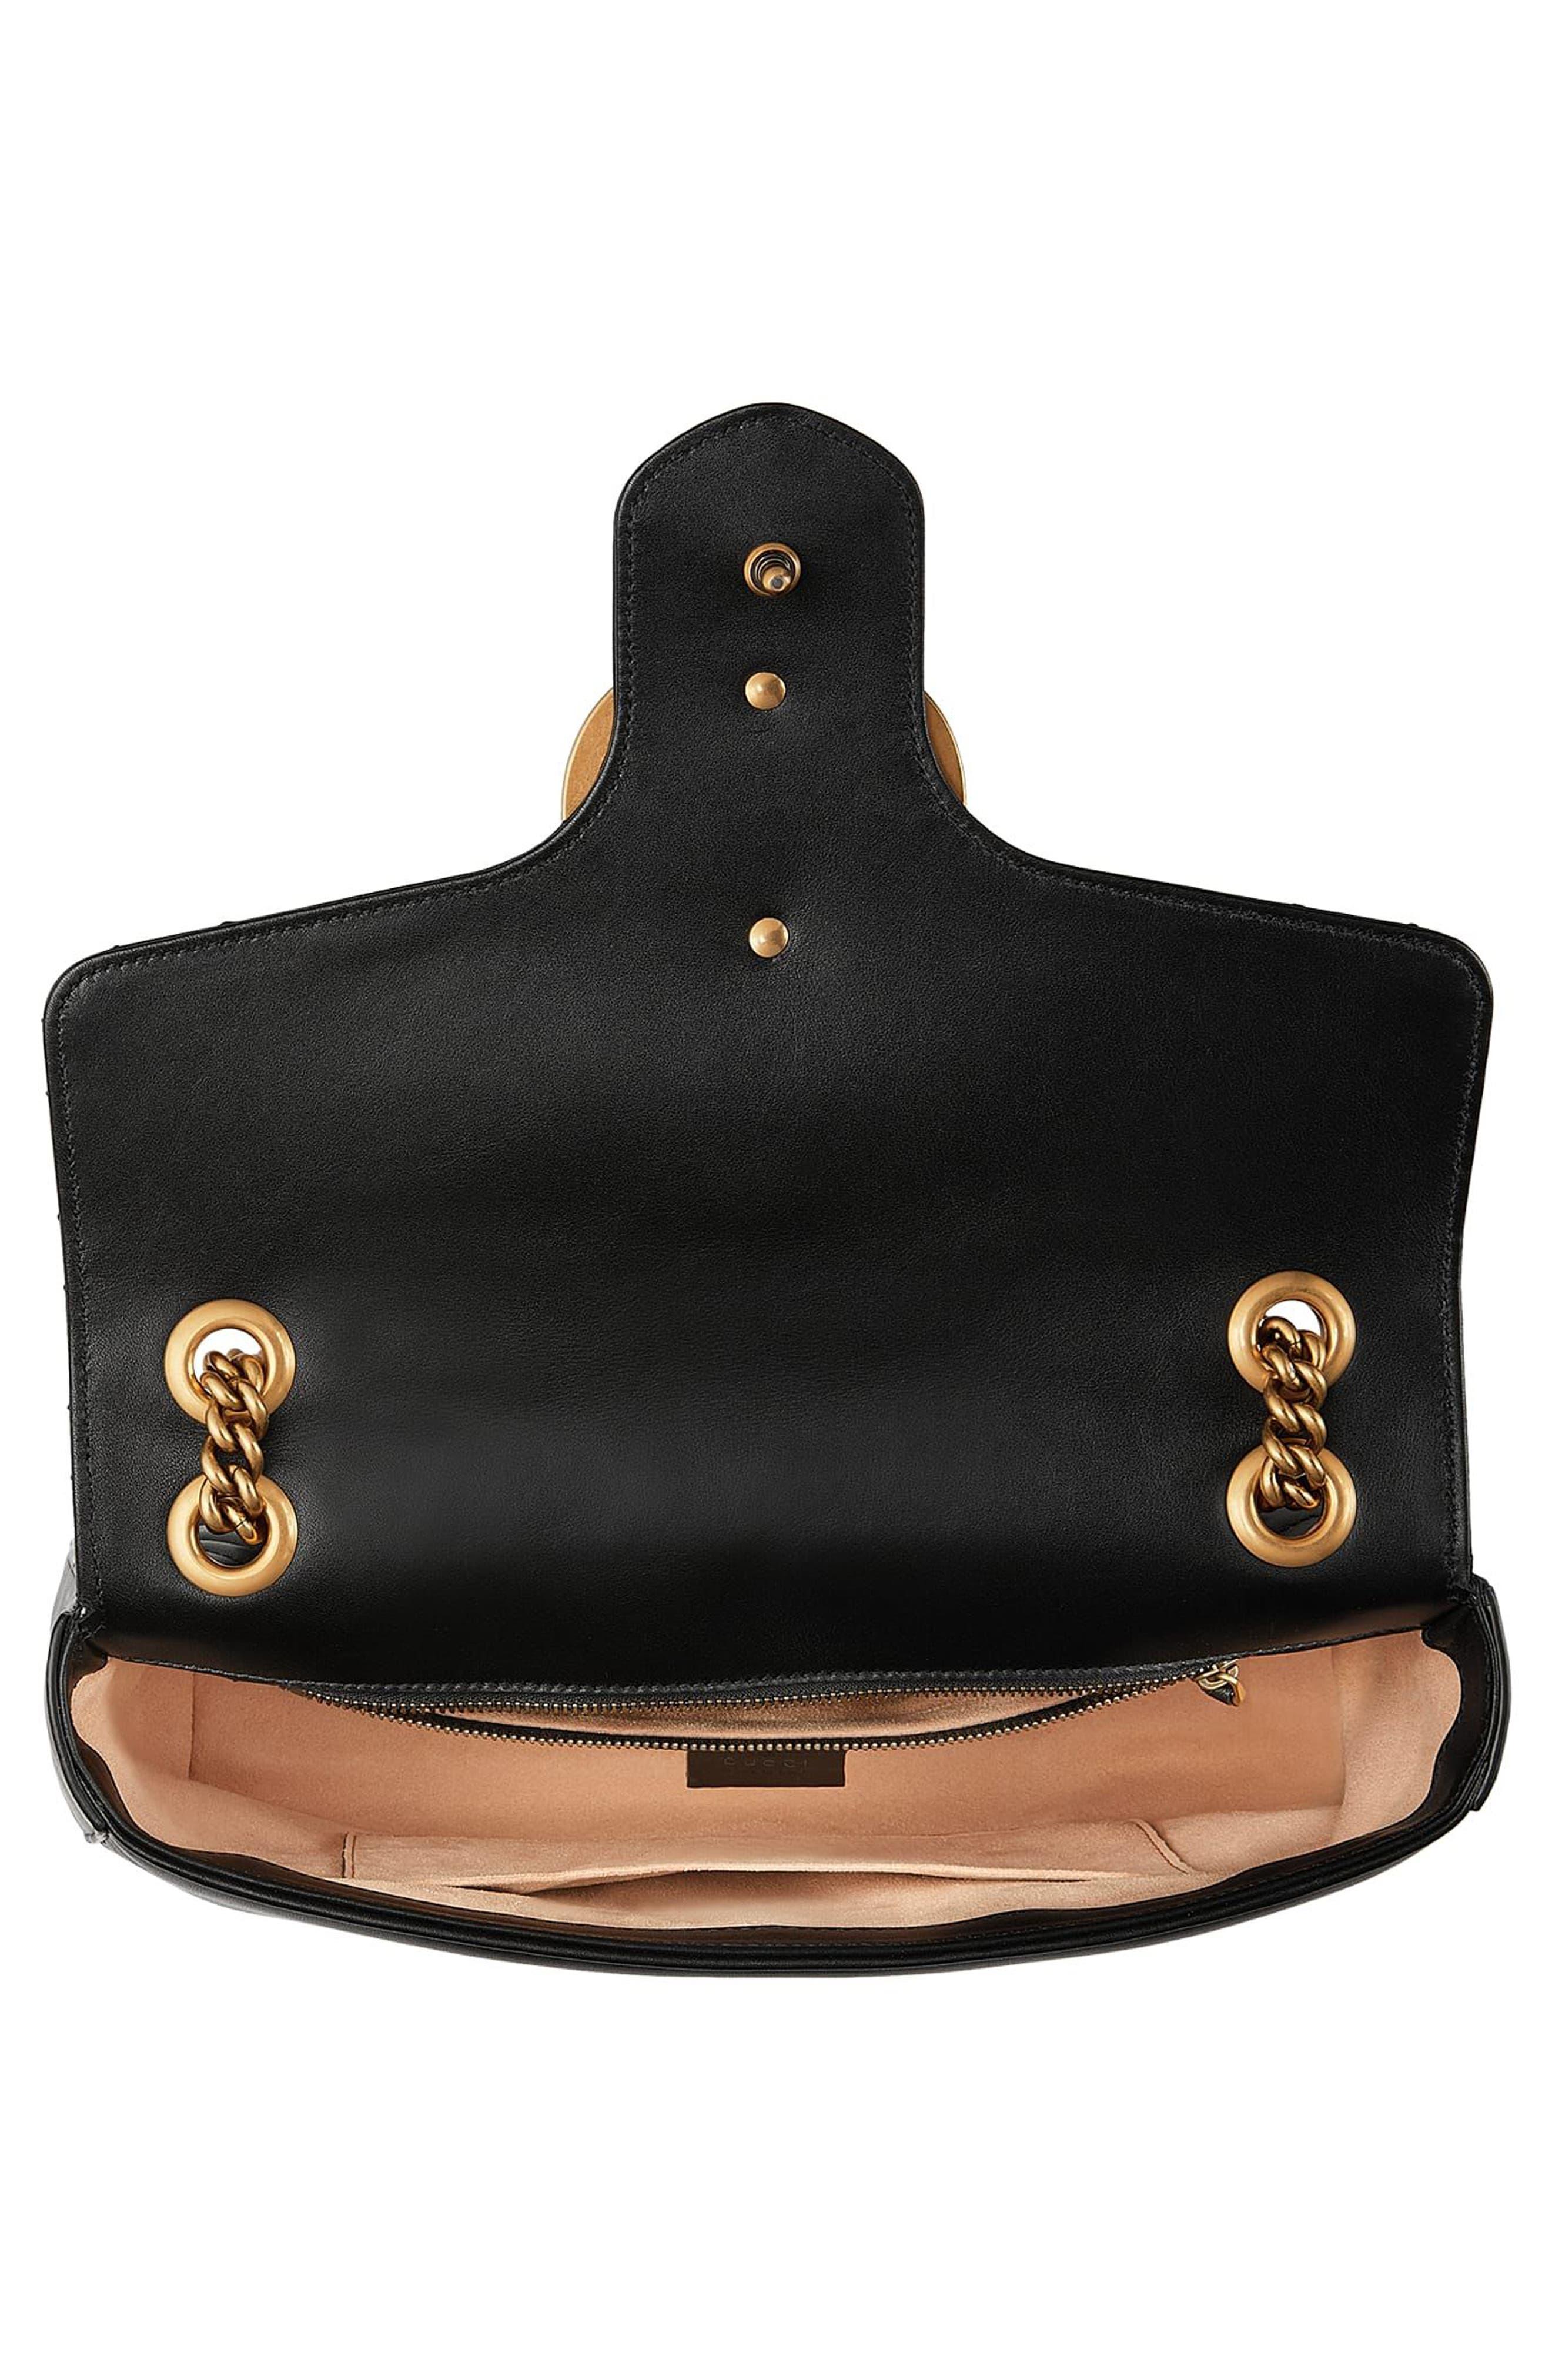 Medium GG Marmont 2.0 Animal Stud Matelassé Leather Shoulder Bag,                             Alternate thumbnail 3, color,                             001